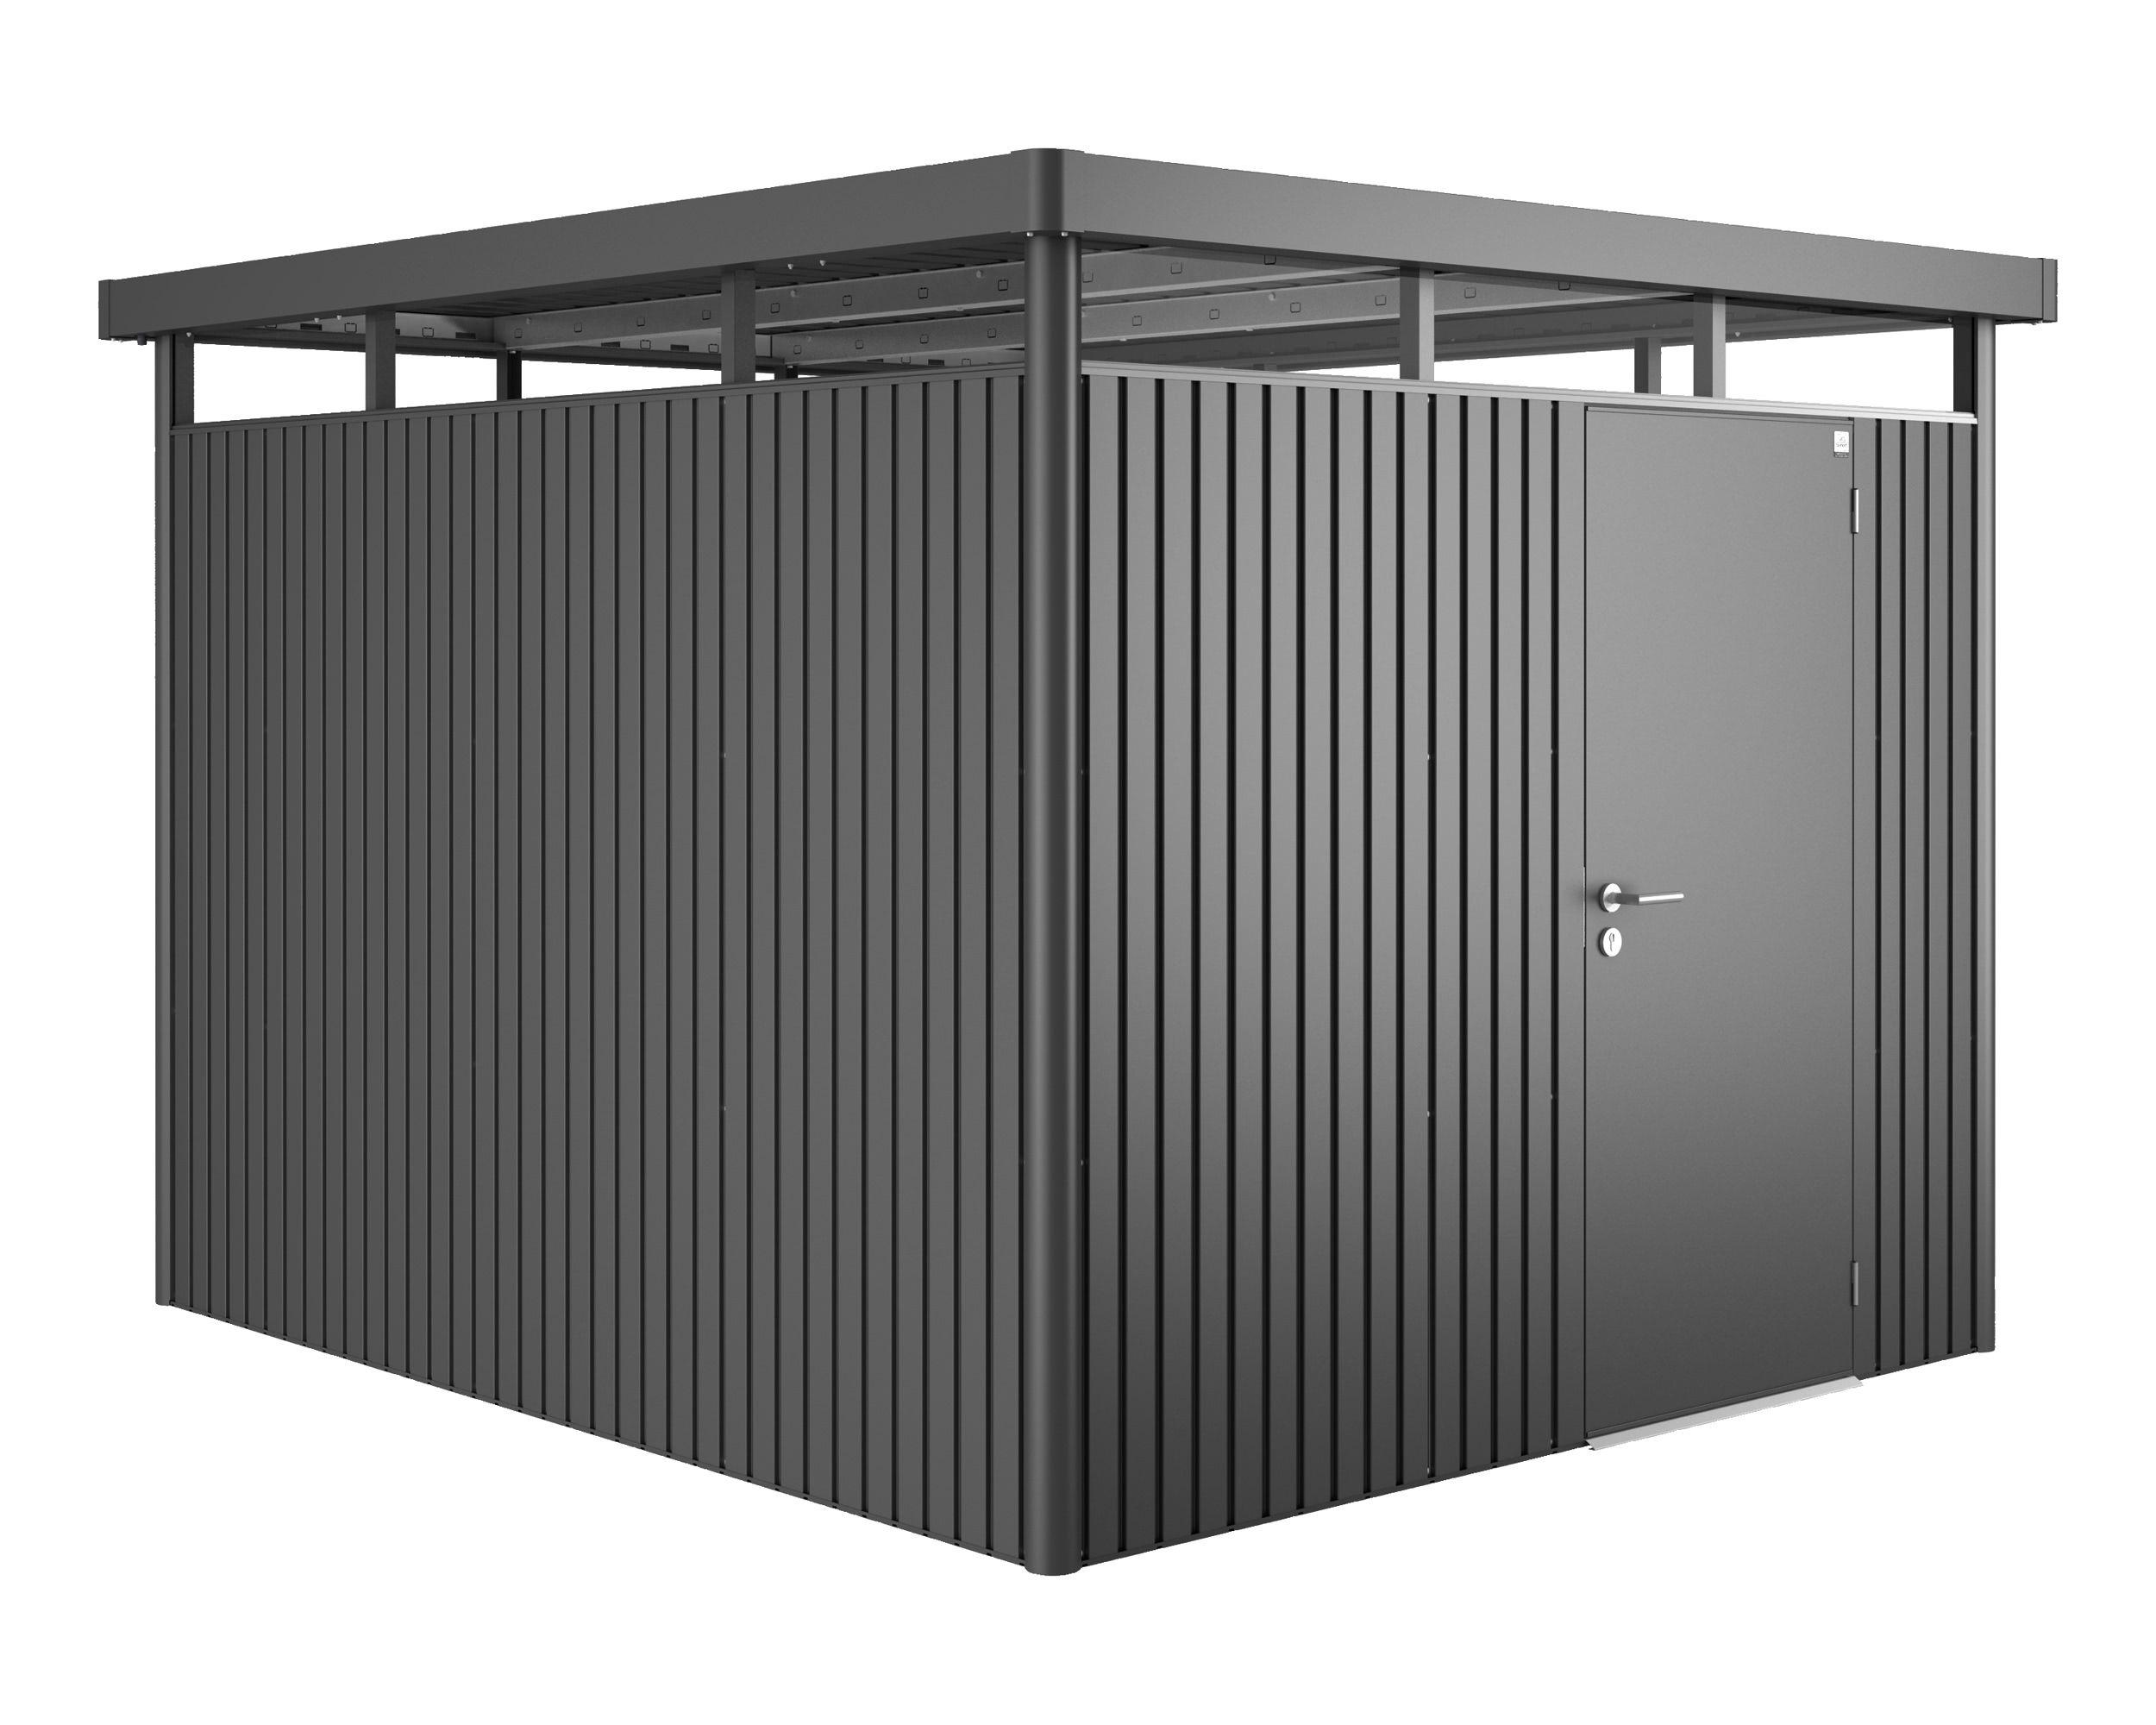 Gerätehaus HighLine 5, Standardtüre